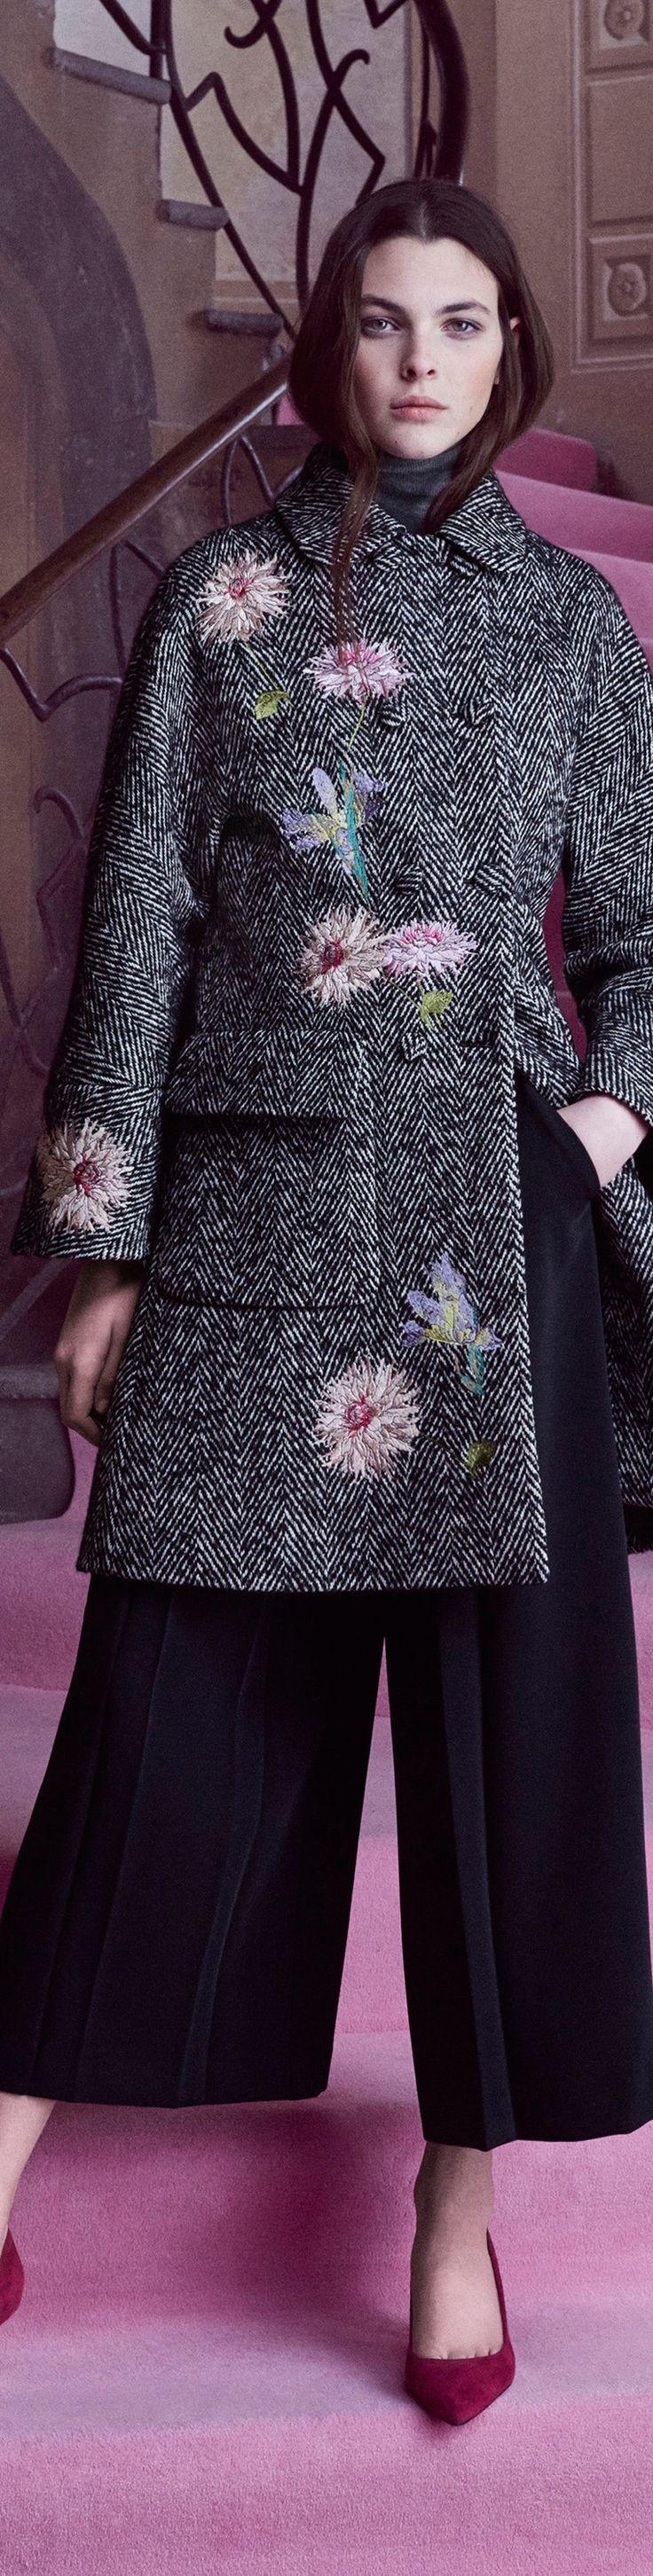 Blumarine Pre F-16: embroidered herringbone coat, grey turtleneck top, black culottes, fuchsia pumps.